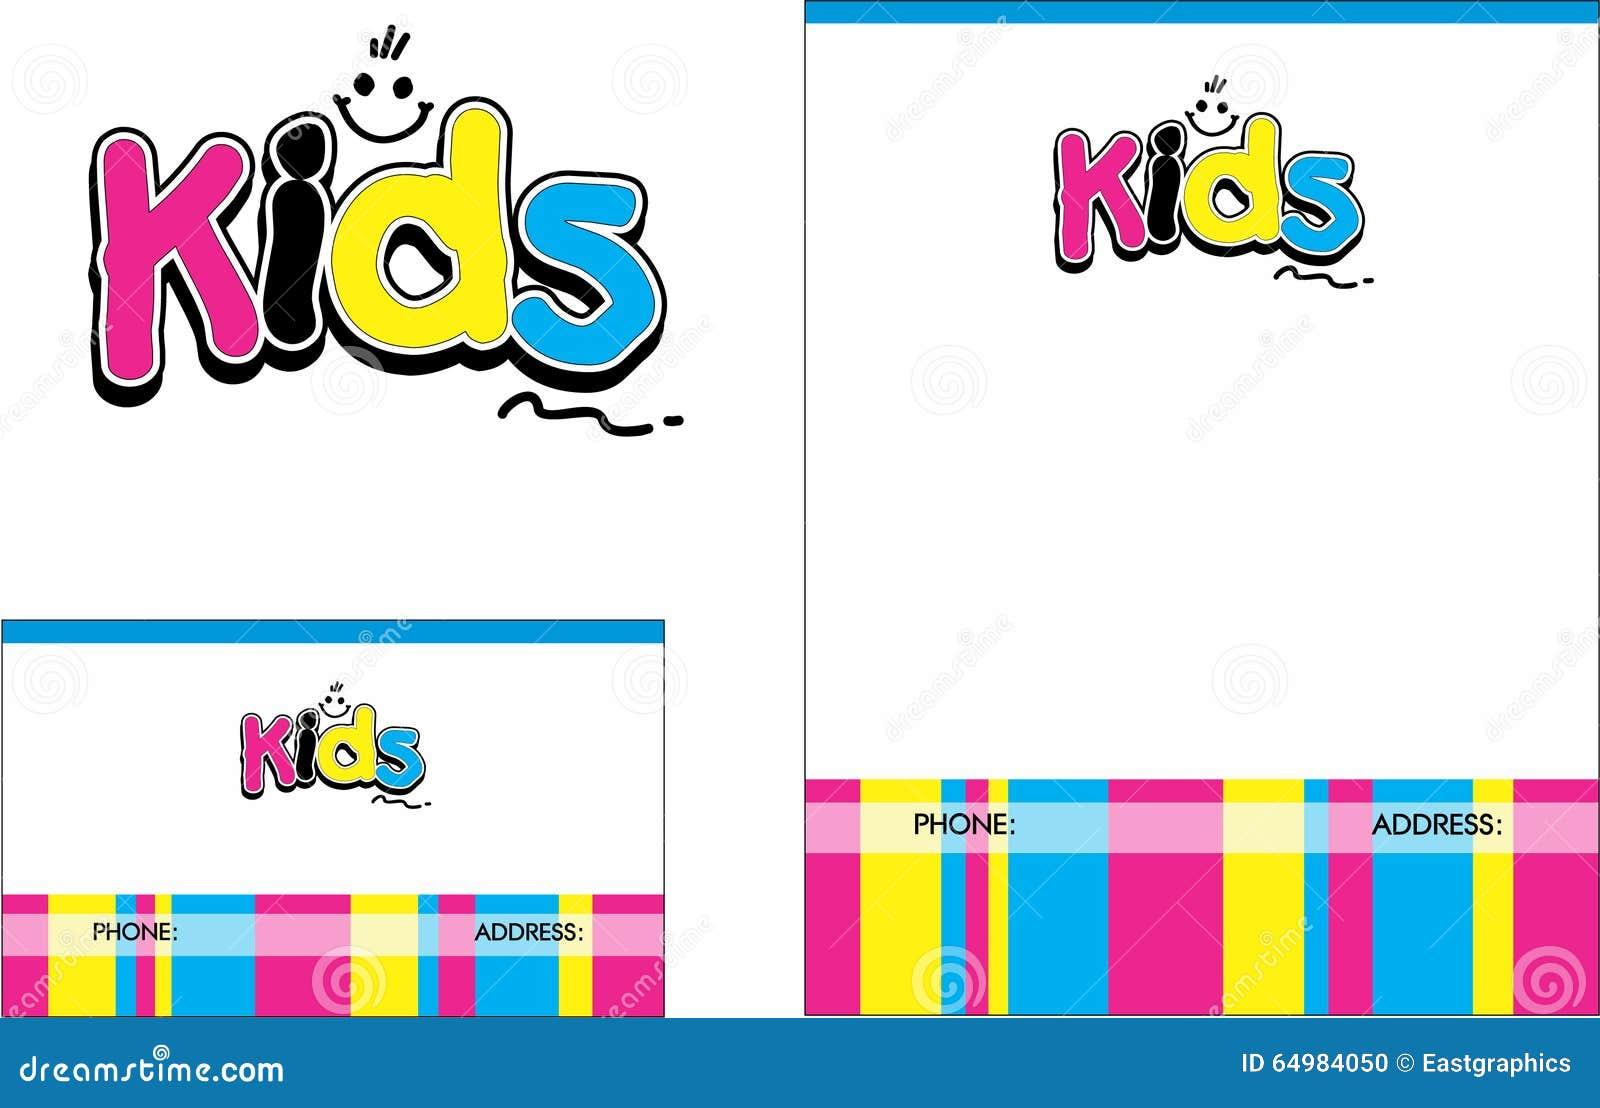 Kids Learning Center School Education Logo, Business Card ,Flyer ...